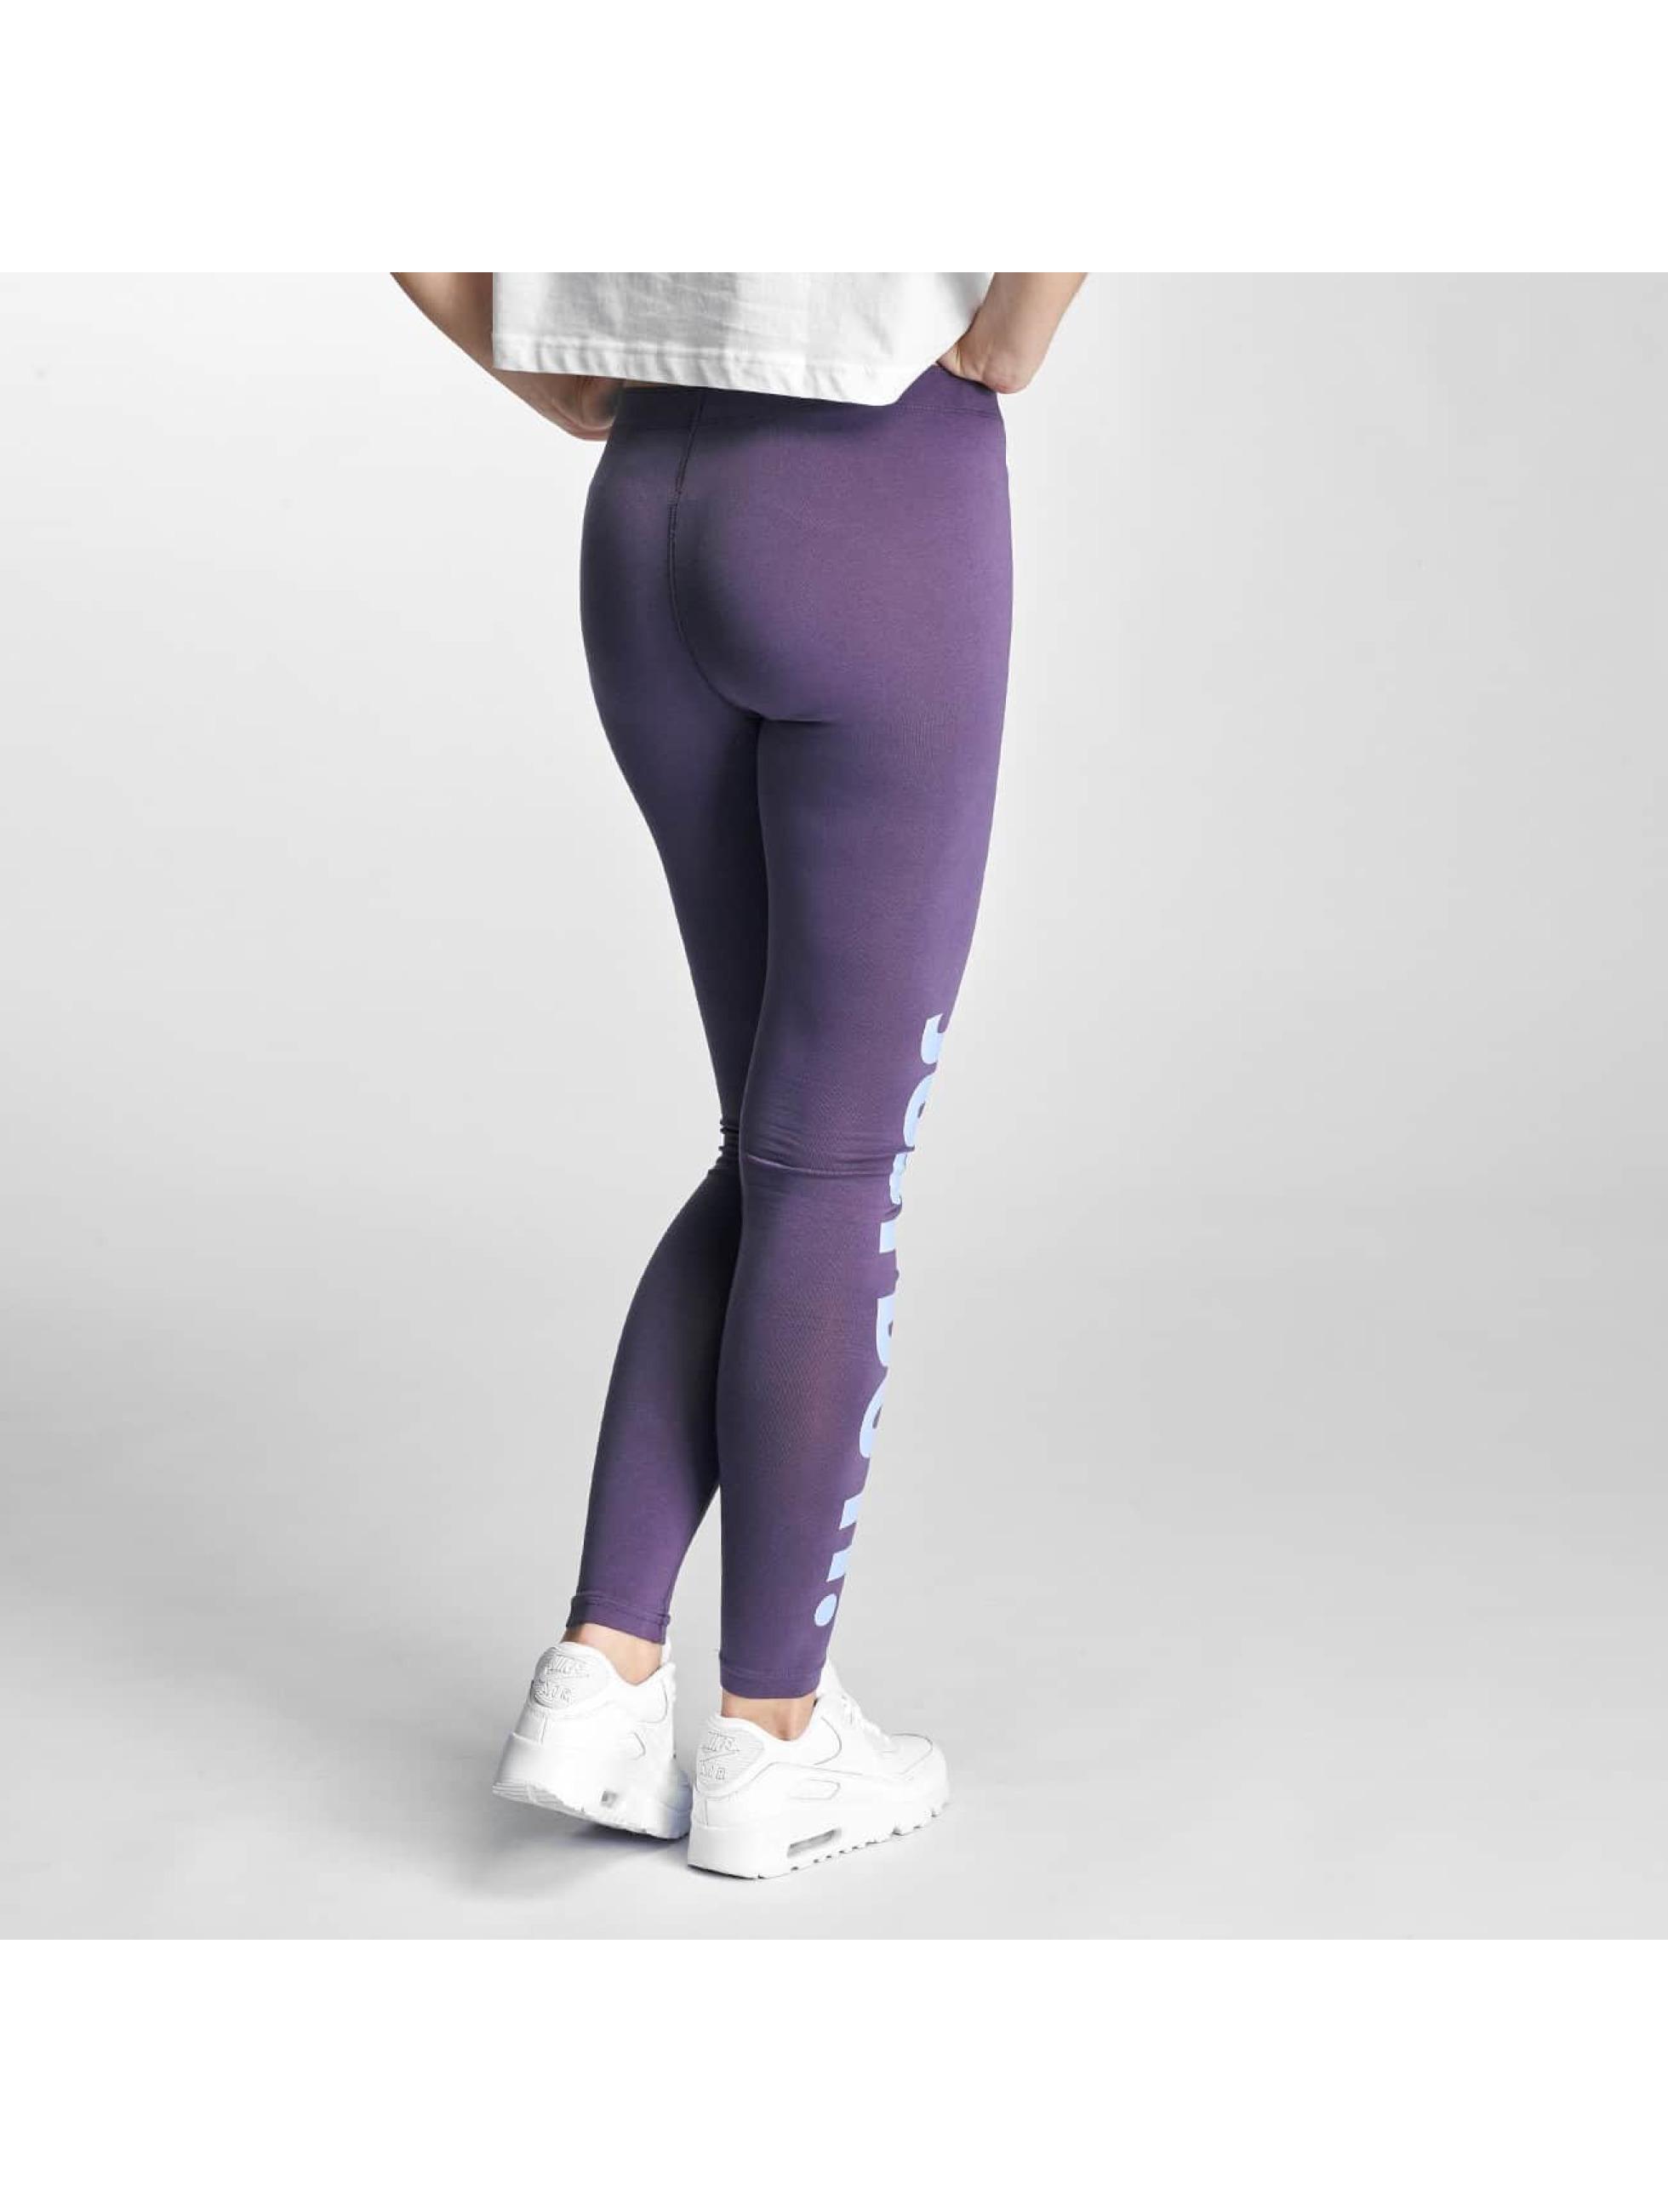 Nike Legíny/Tregíny Leg-A-See Just Do It fialová